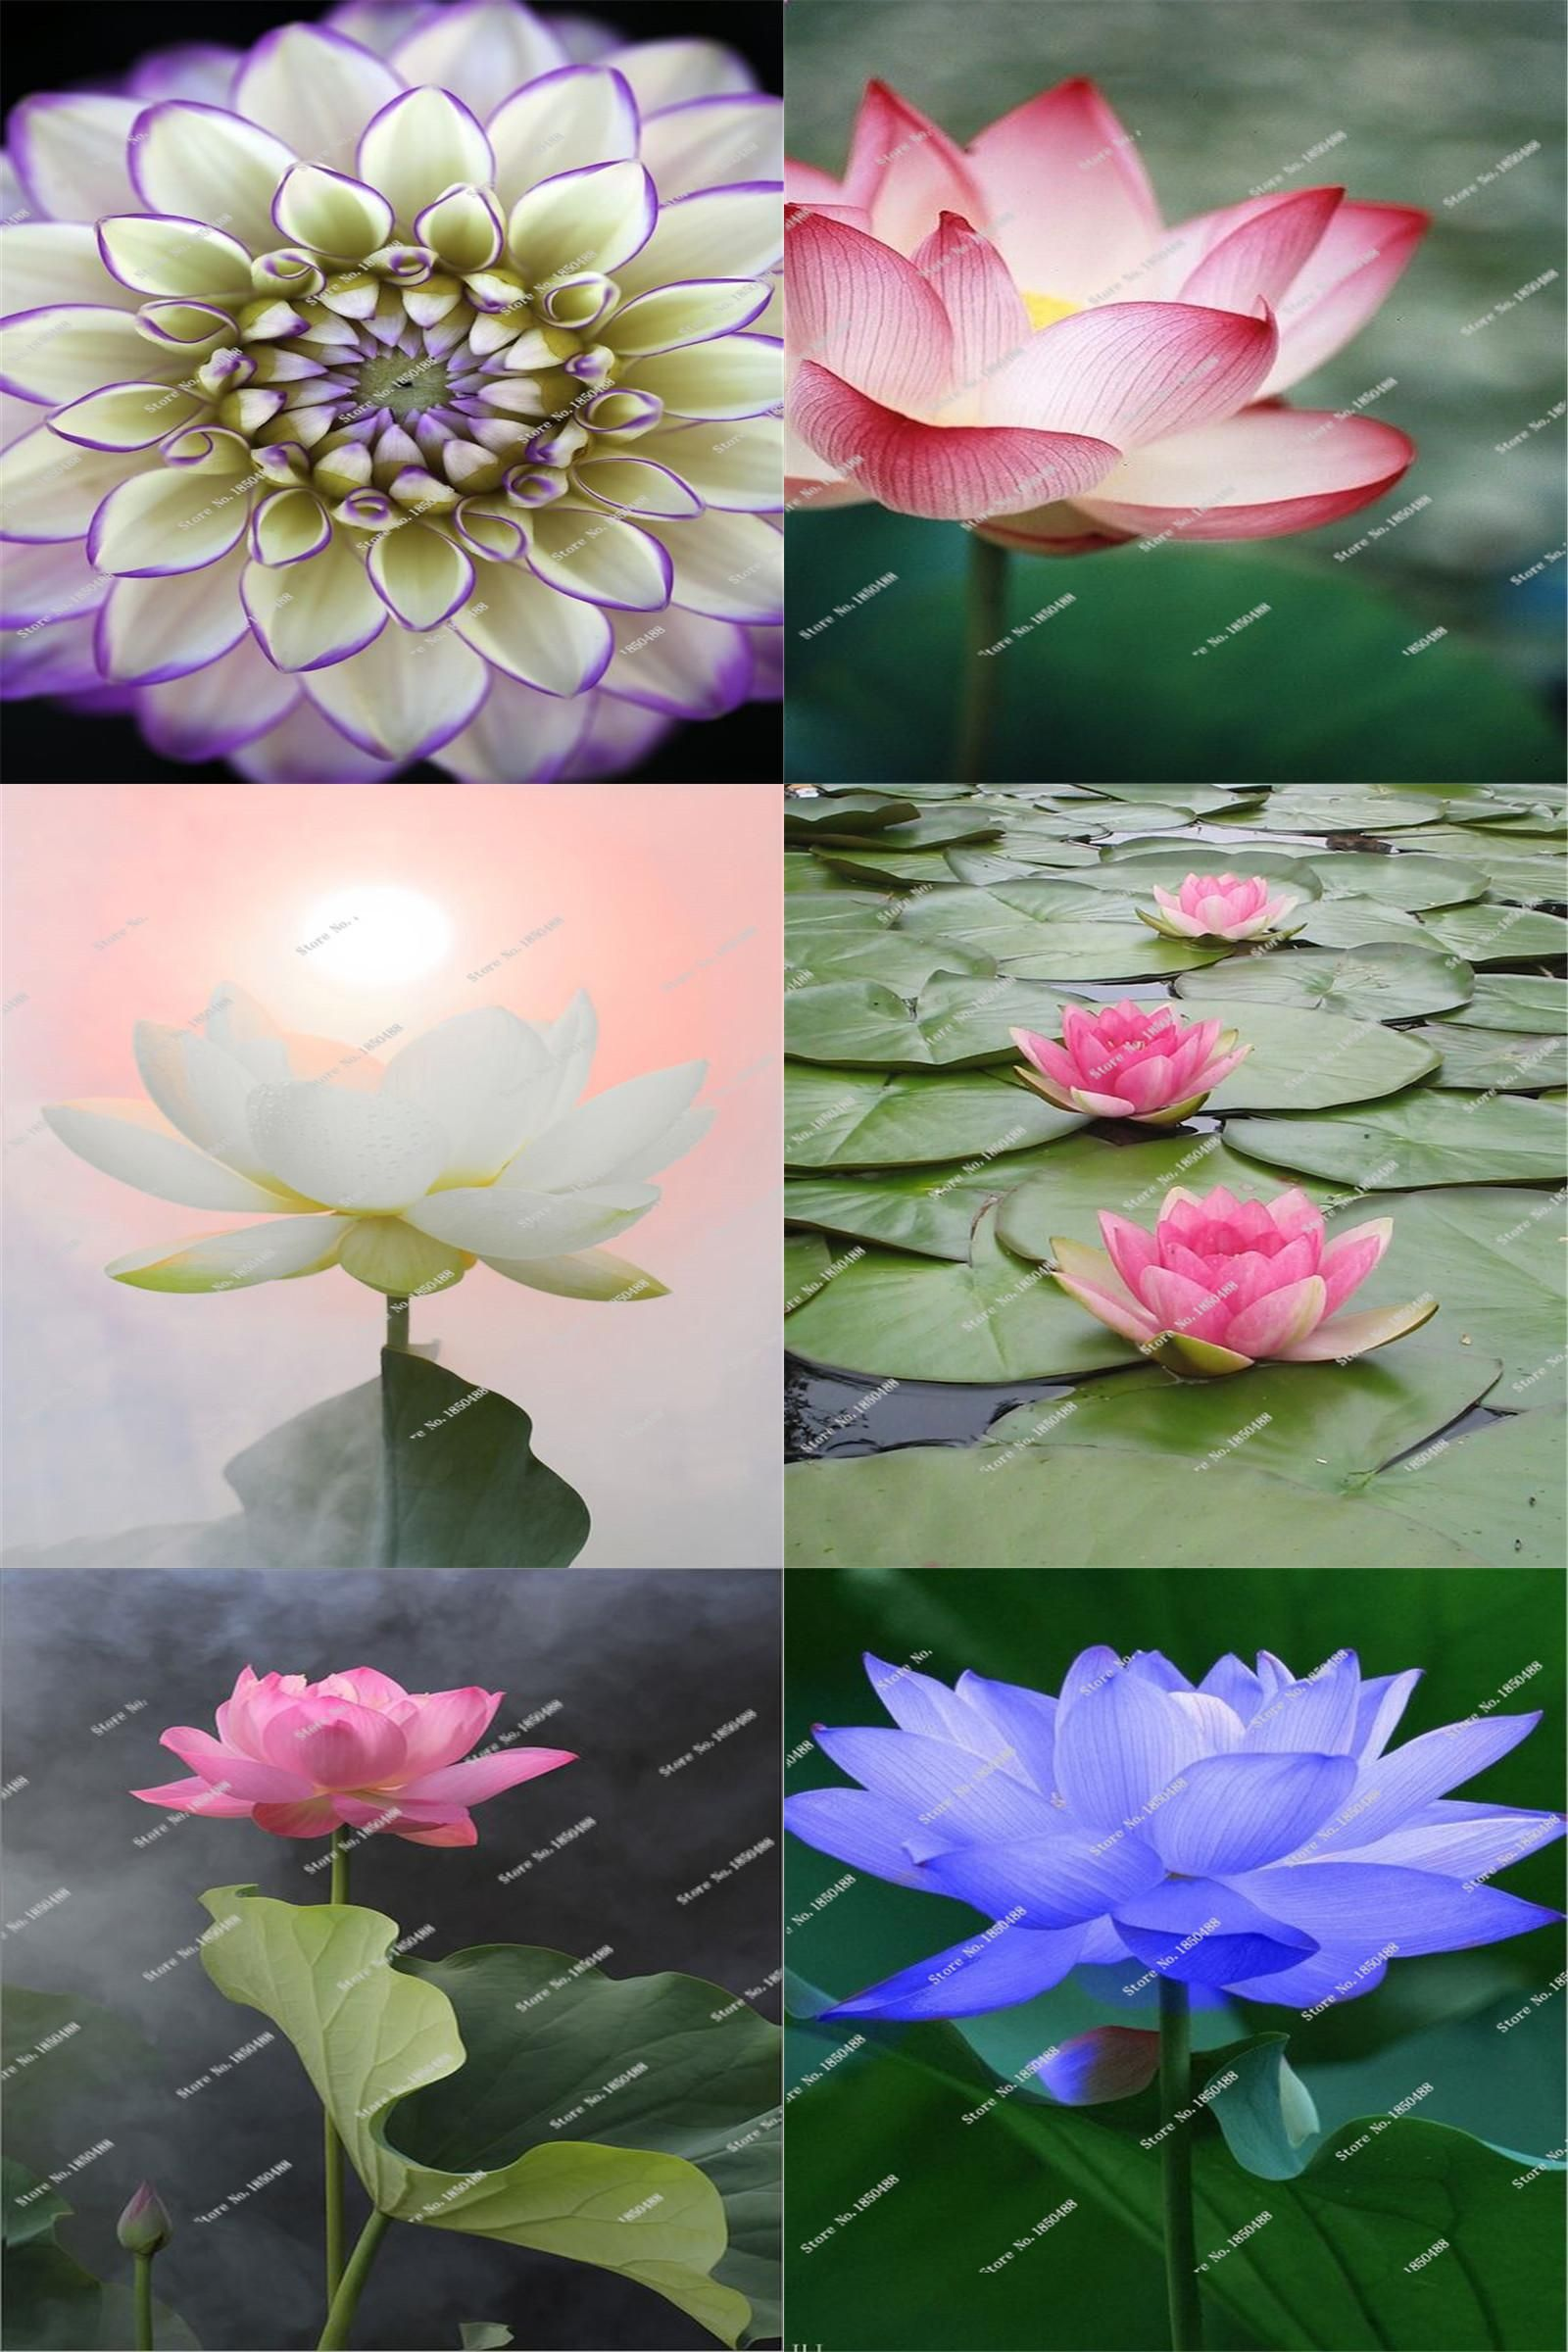 Visit to Buy] 5 Pcs / Bag Lotus Flower Seeds DIY Potted Plants ...